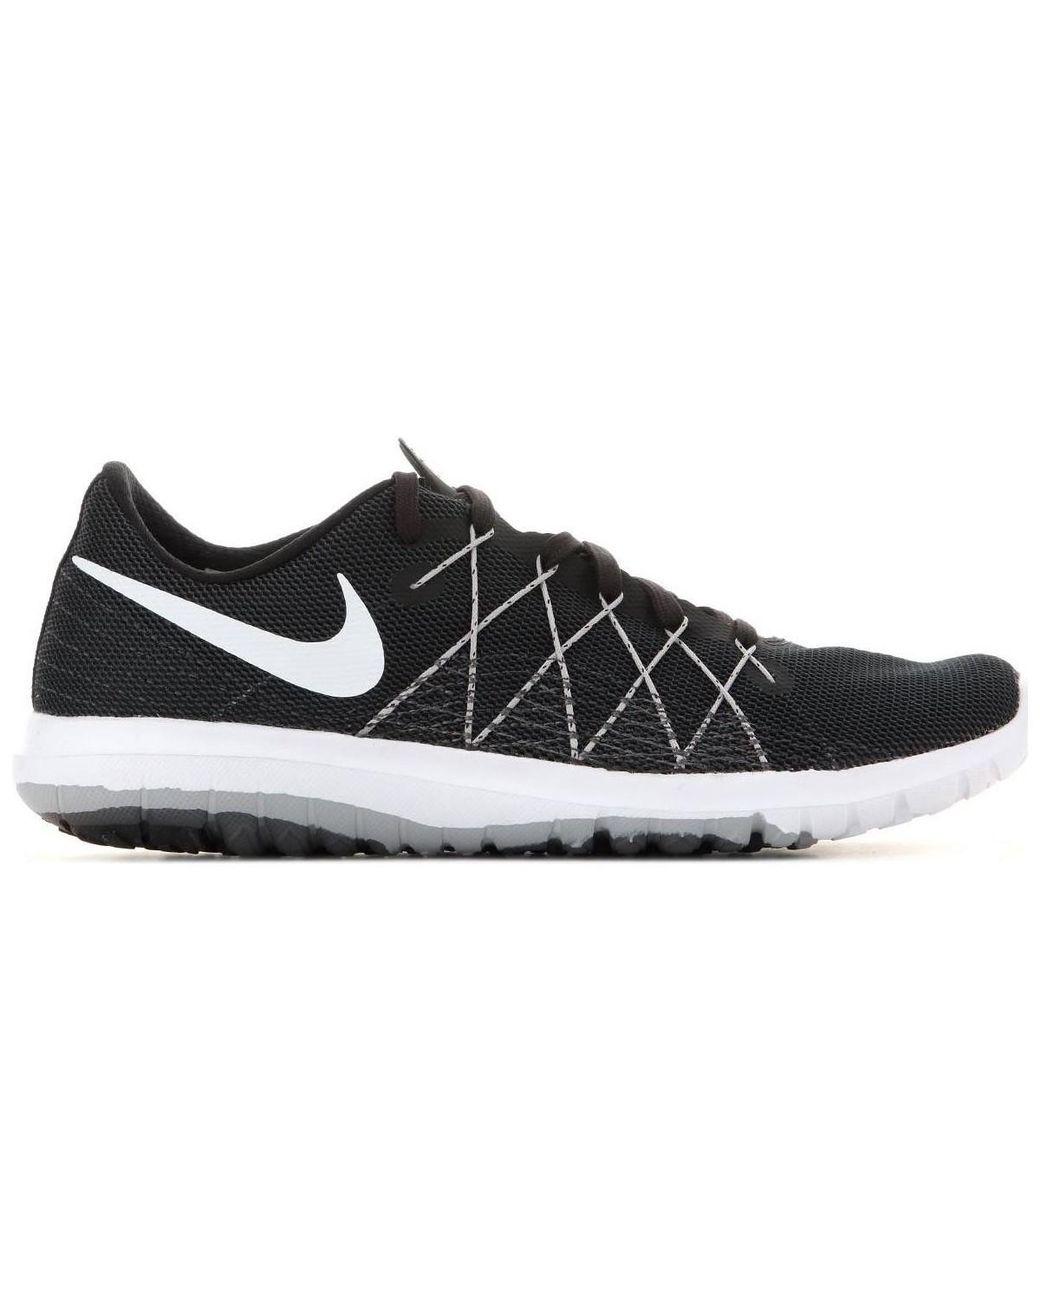 adc417fe2b2 Nike Wmns Flex Fury 2 819135-001 Women s Trainers In Black in Black ...